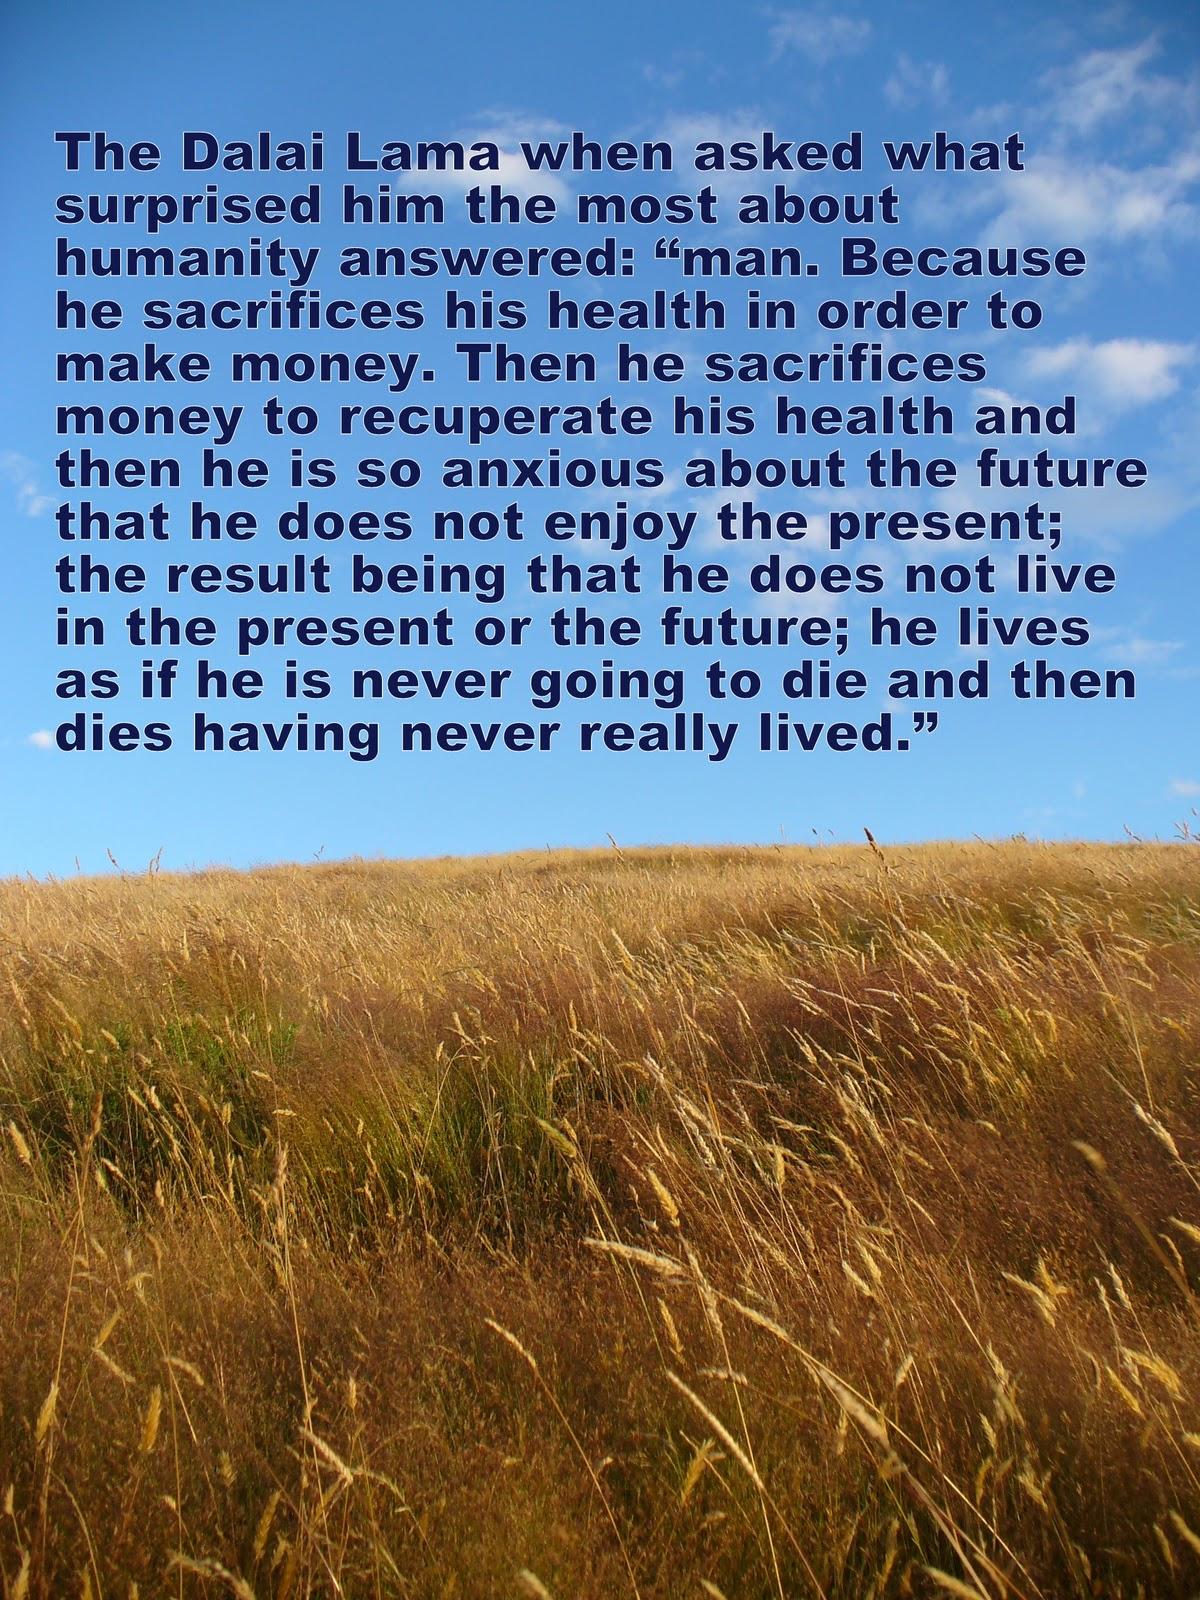 dalai lama quotes on life - photo #35